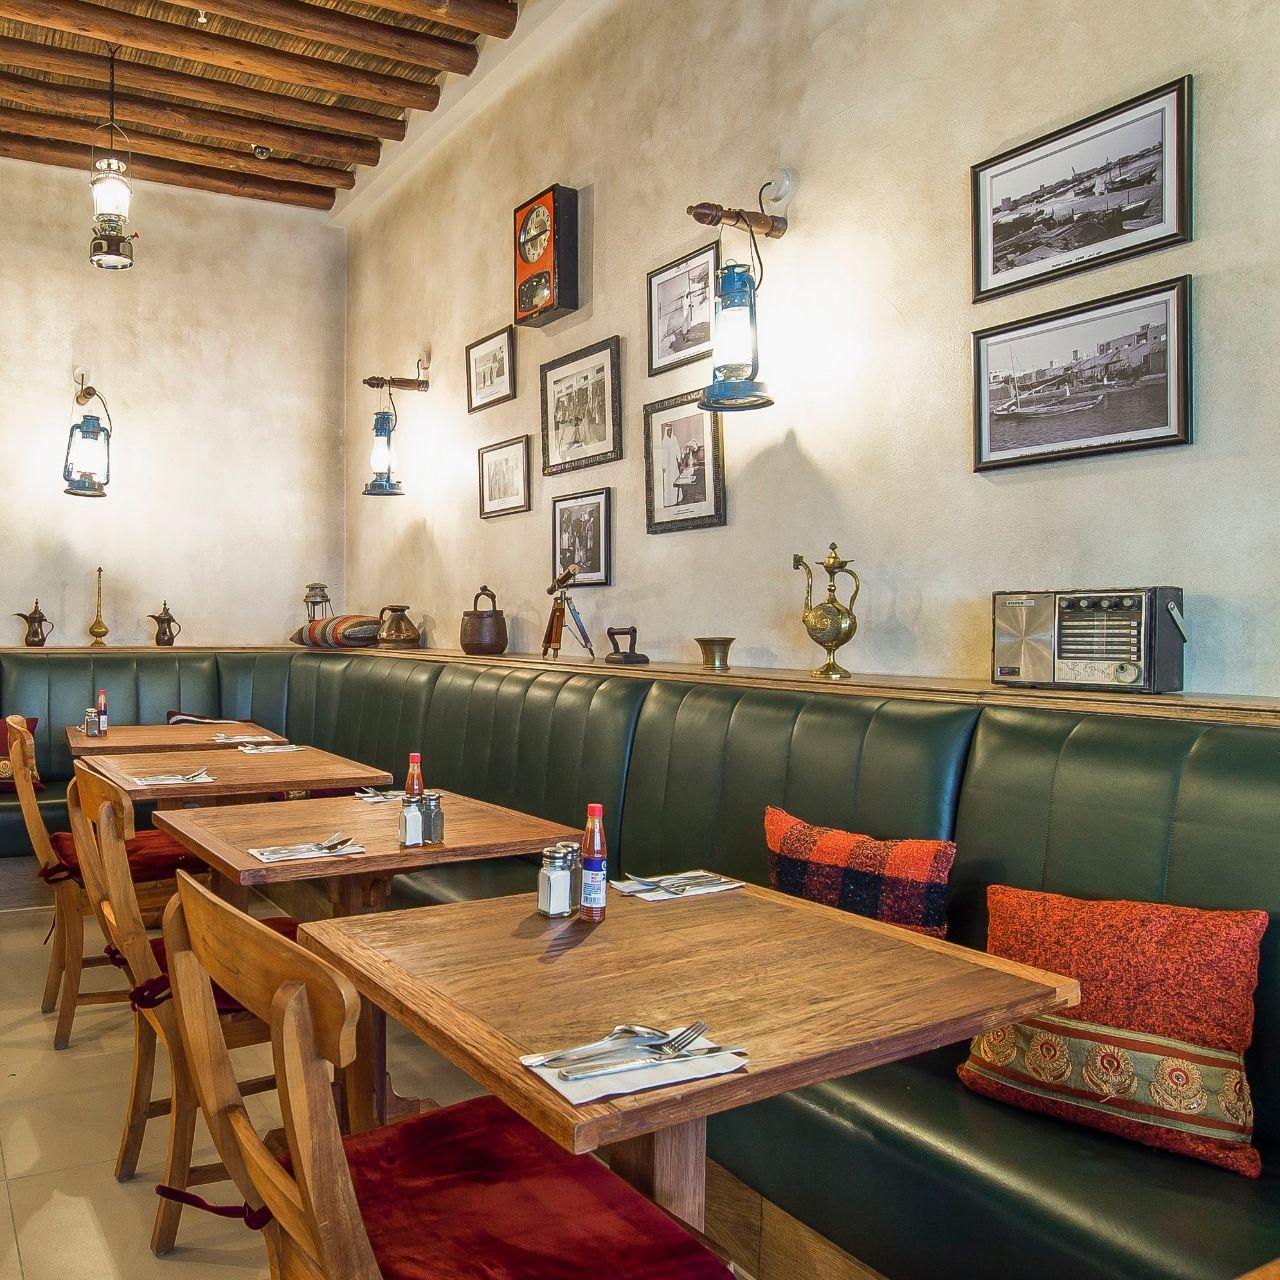 Al Fanar Restaurant and Café